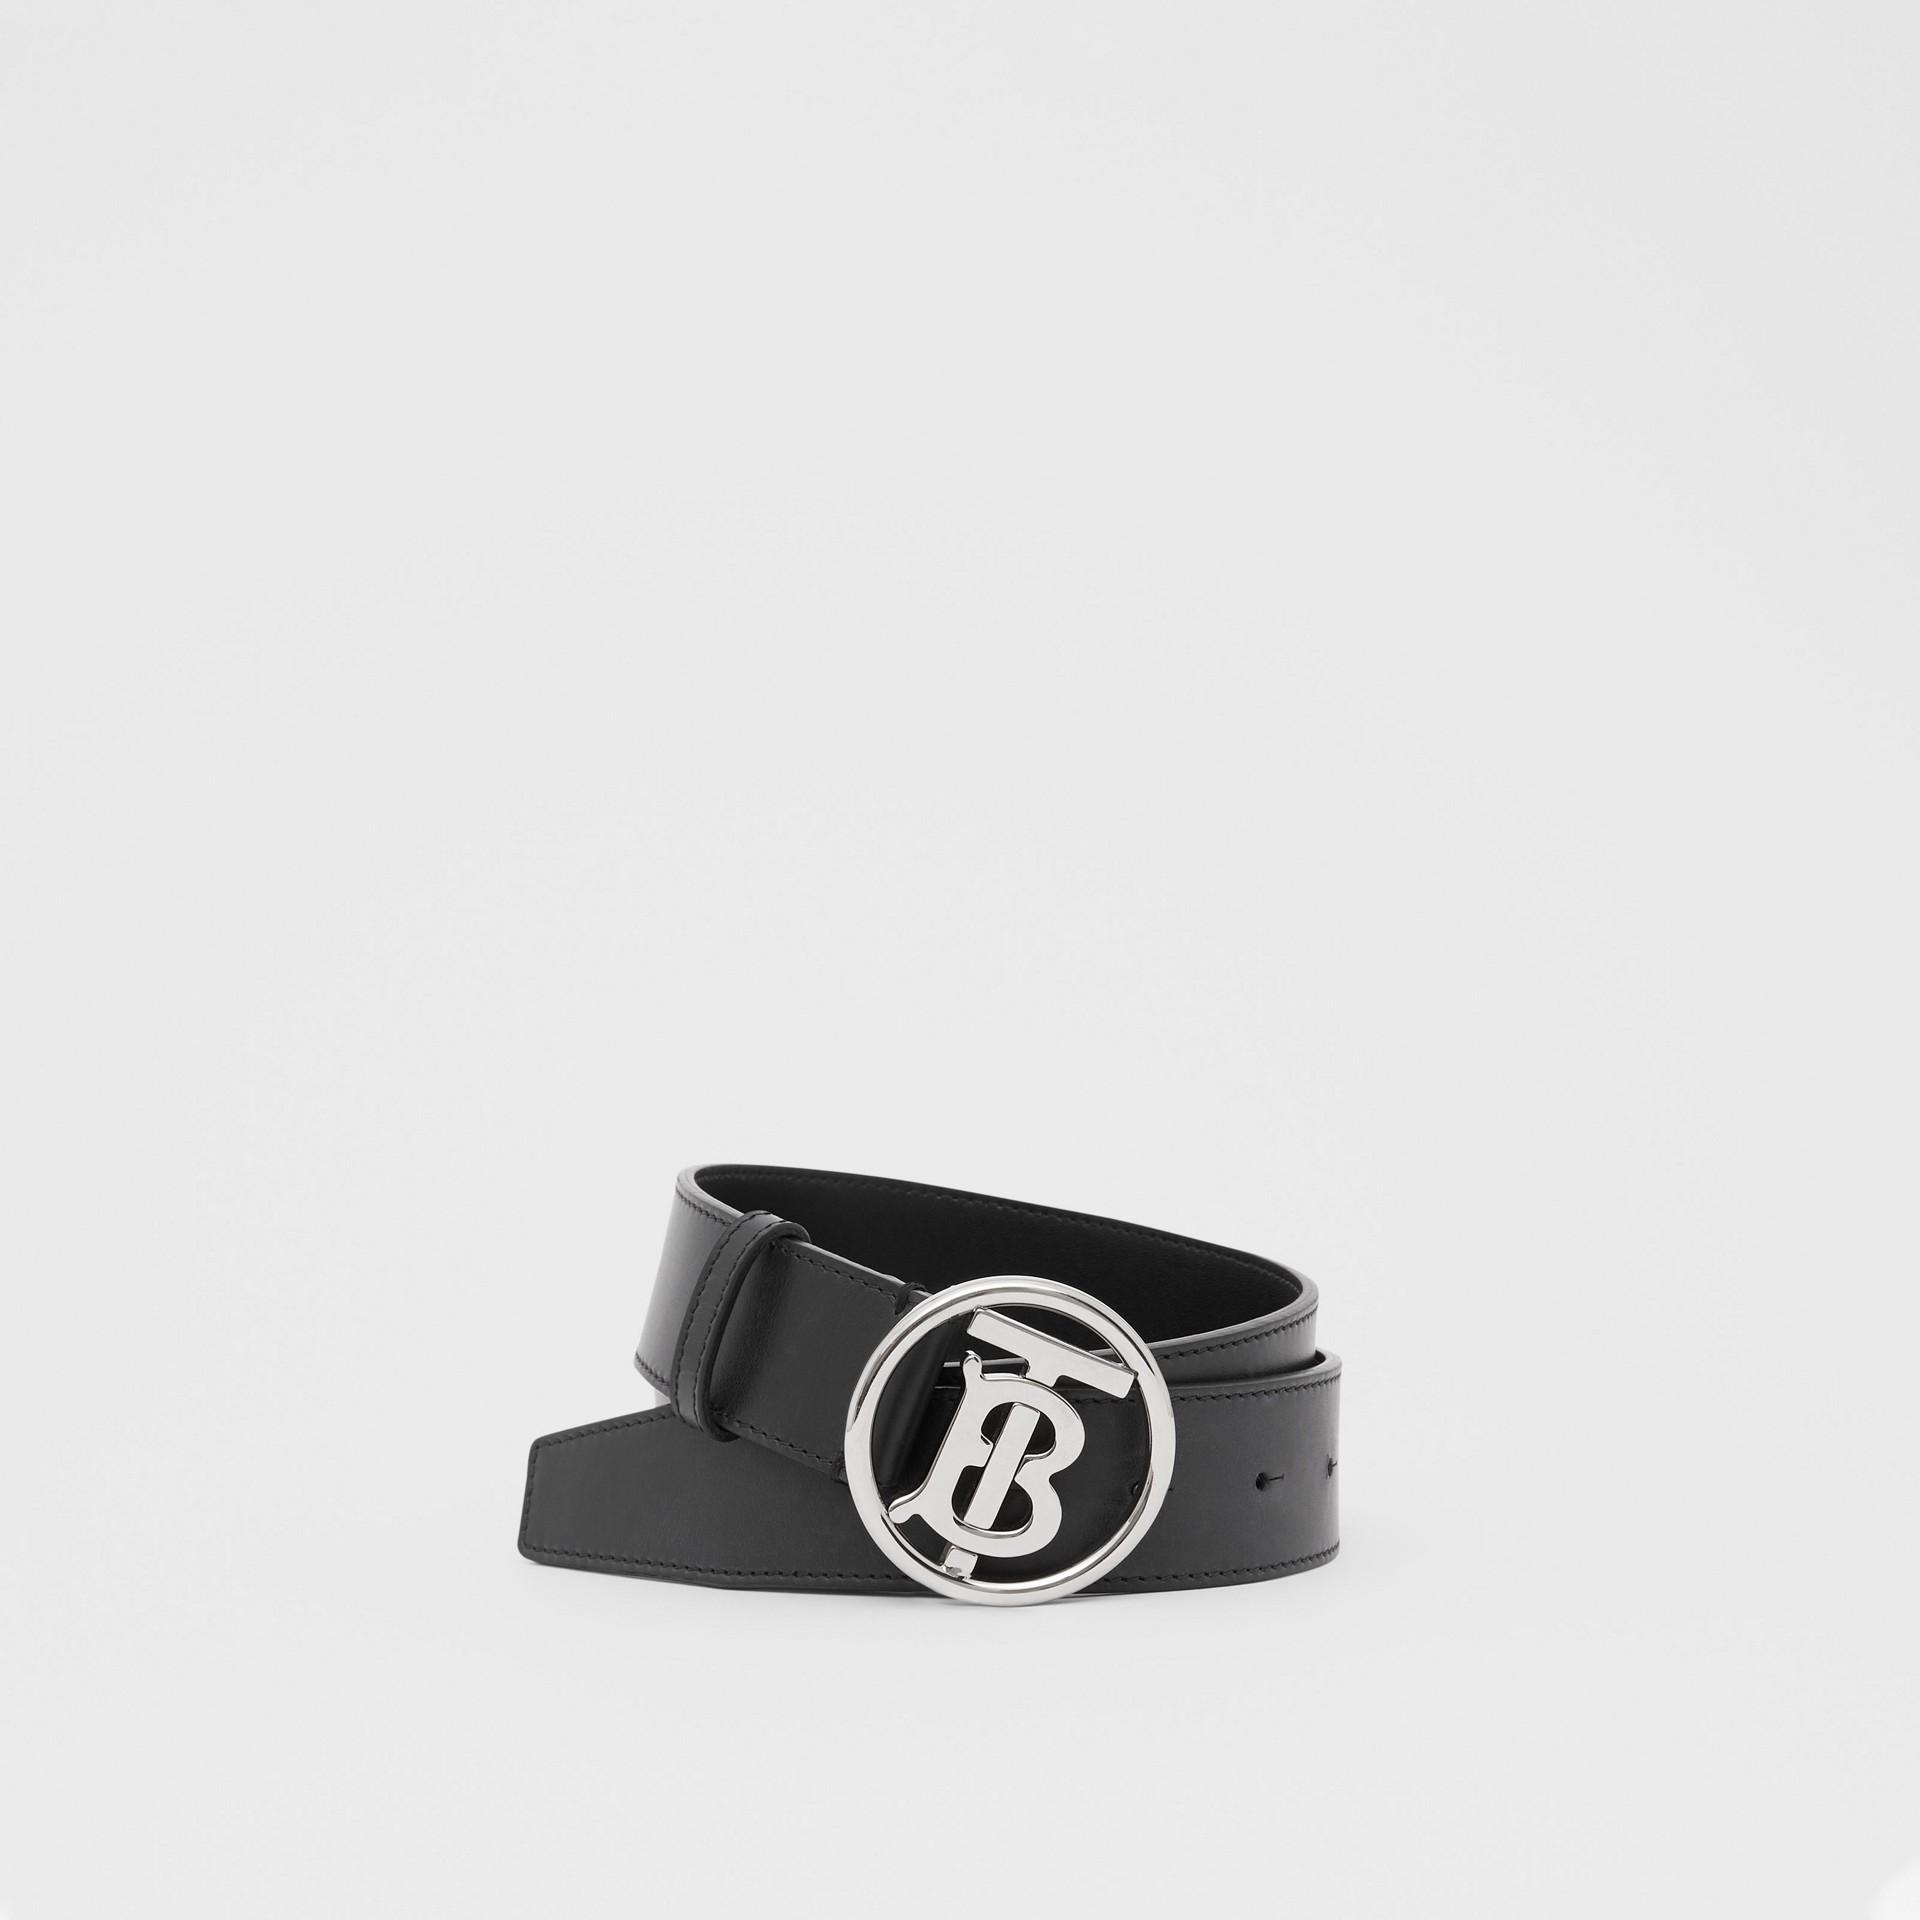 Monogram Motif Leather Belt in Black - Men | Burberry - gallery image 0